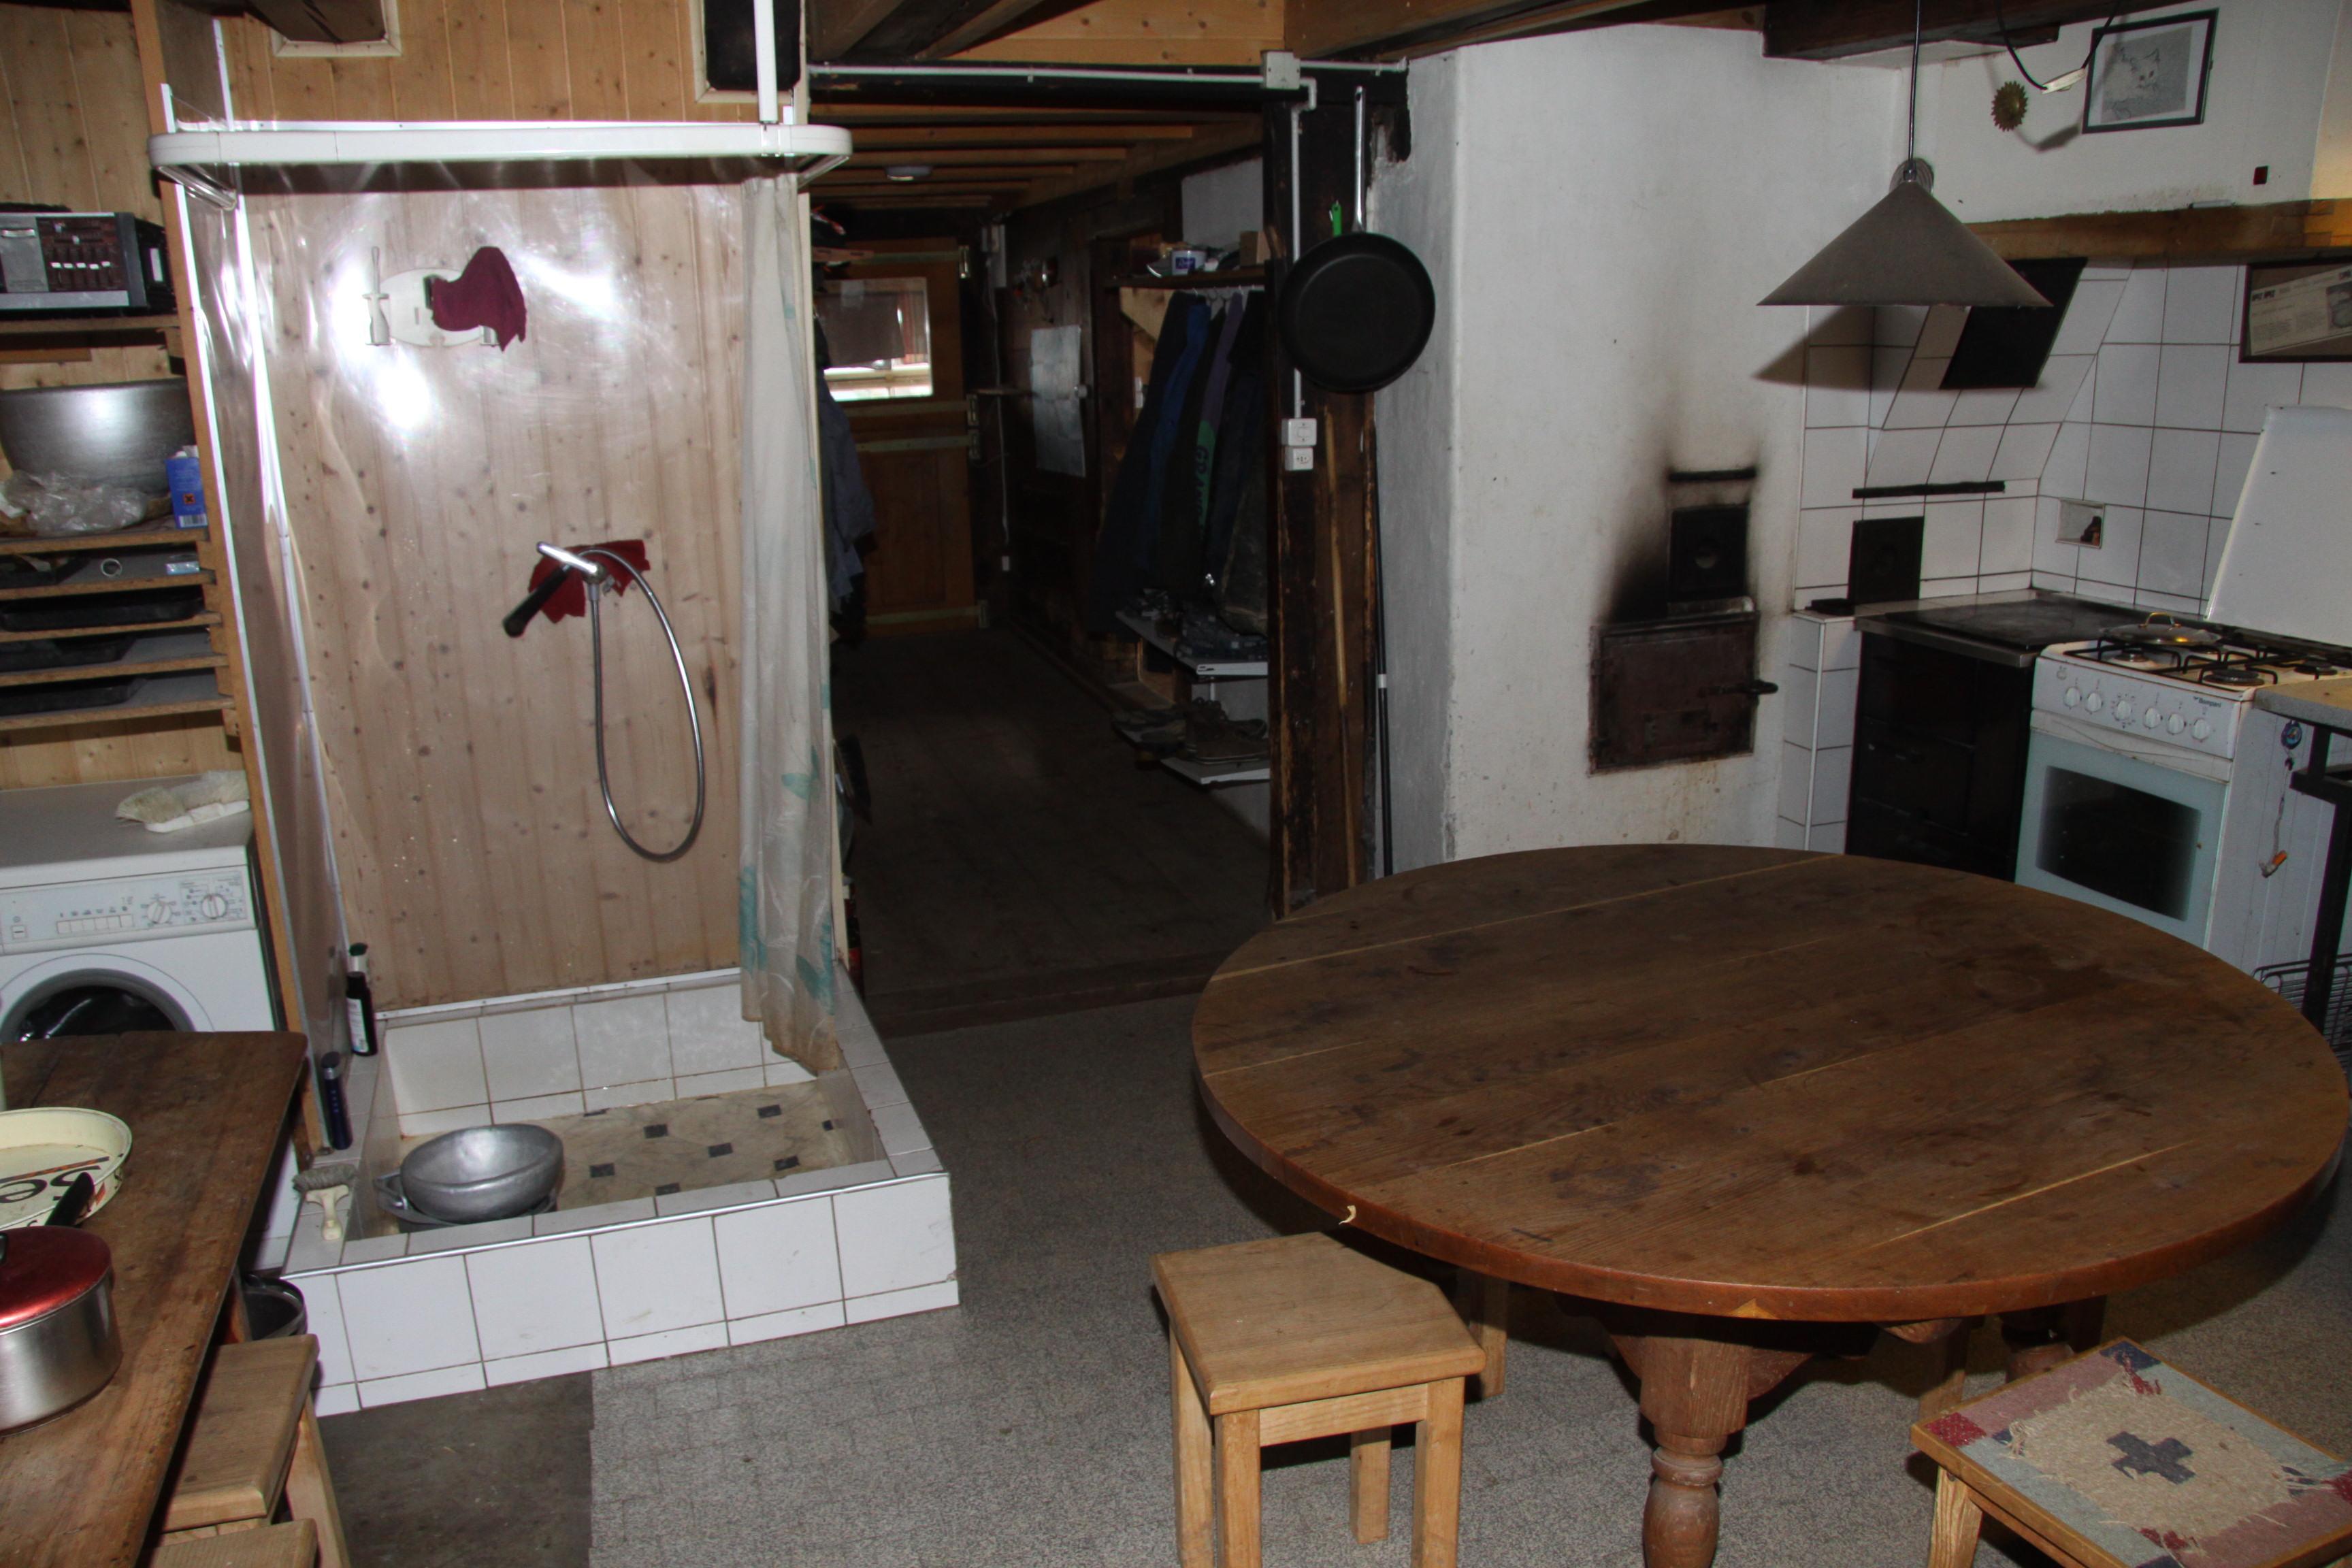 sommerserie 2013 hausbesuch seite 8. Black Bedroom Furniture Sets. Home Design Ideas